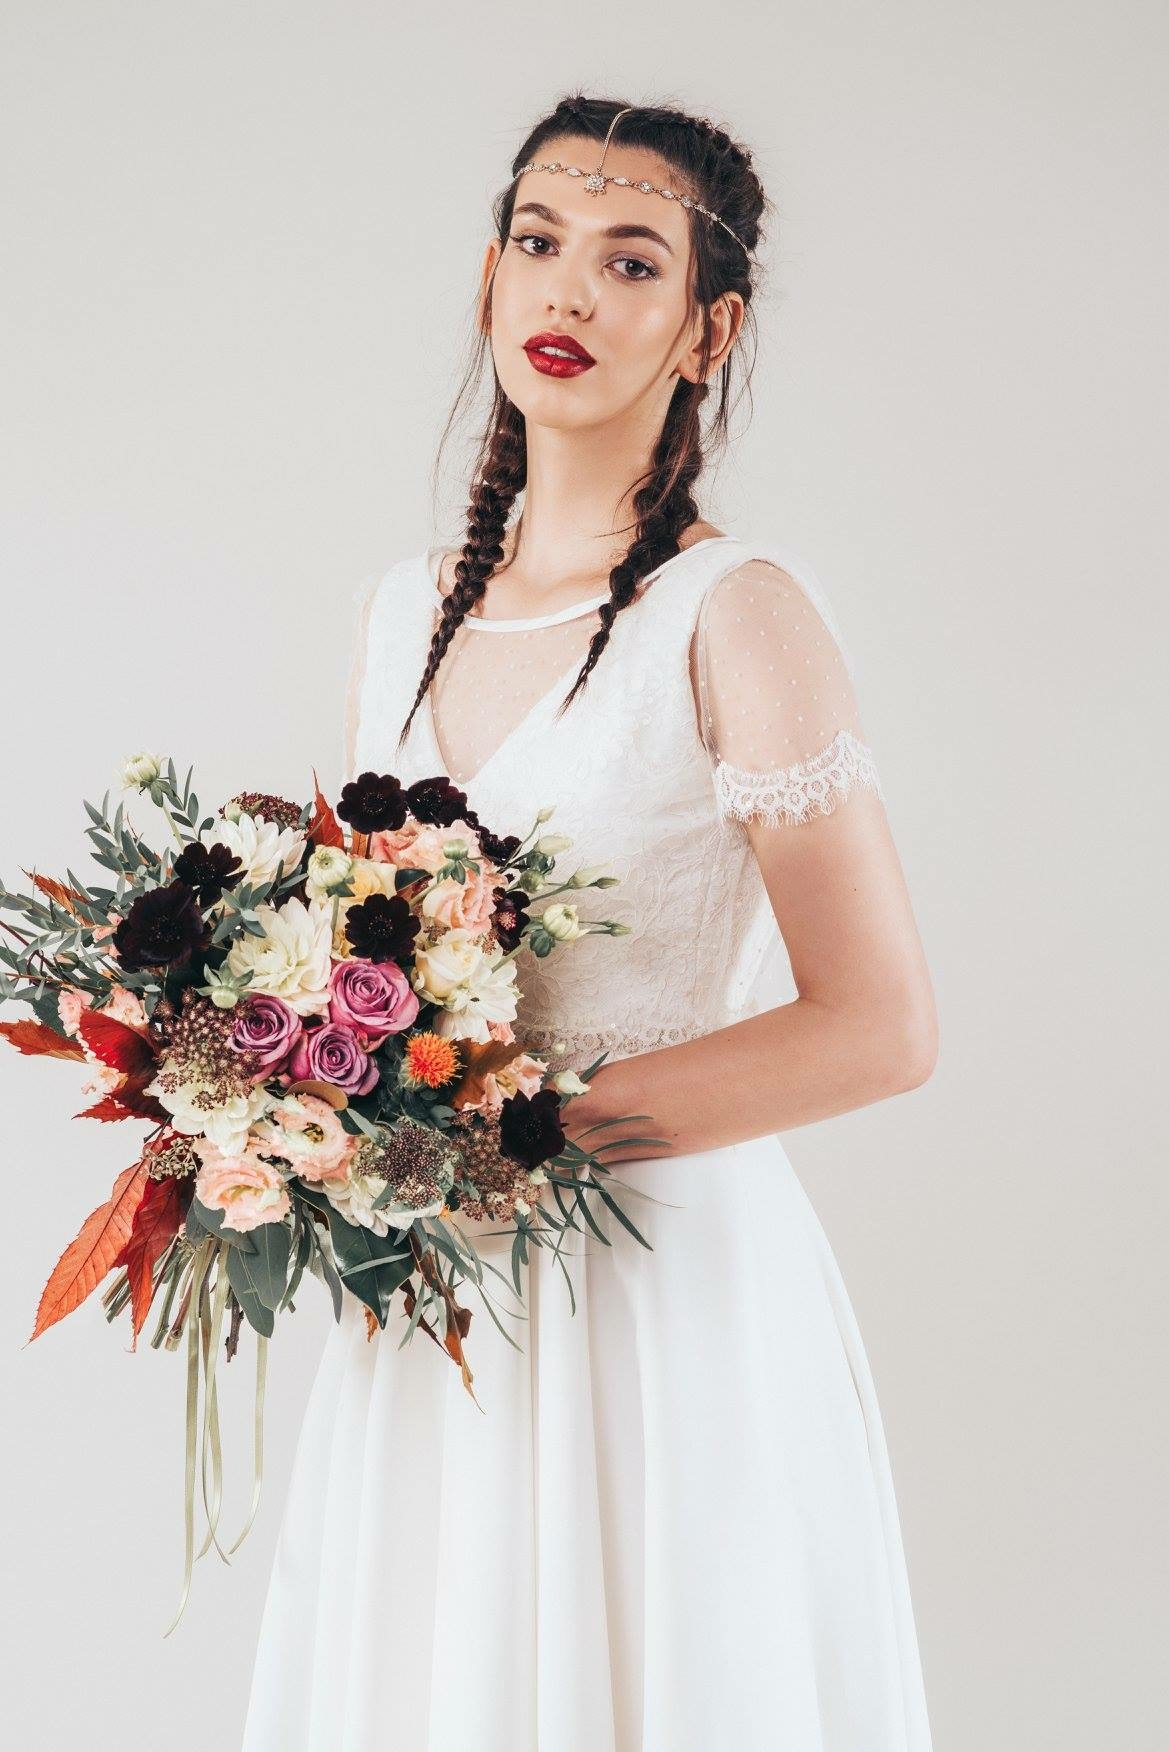 Choosing your wedding hairstyle   Blog   Melissa Salons